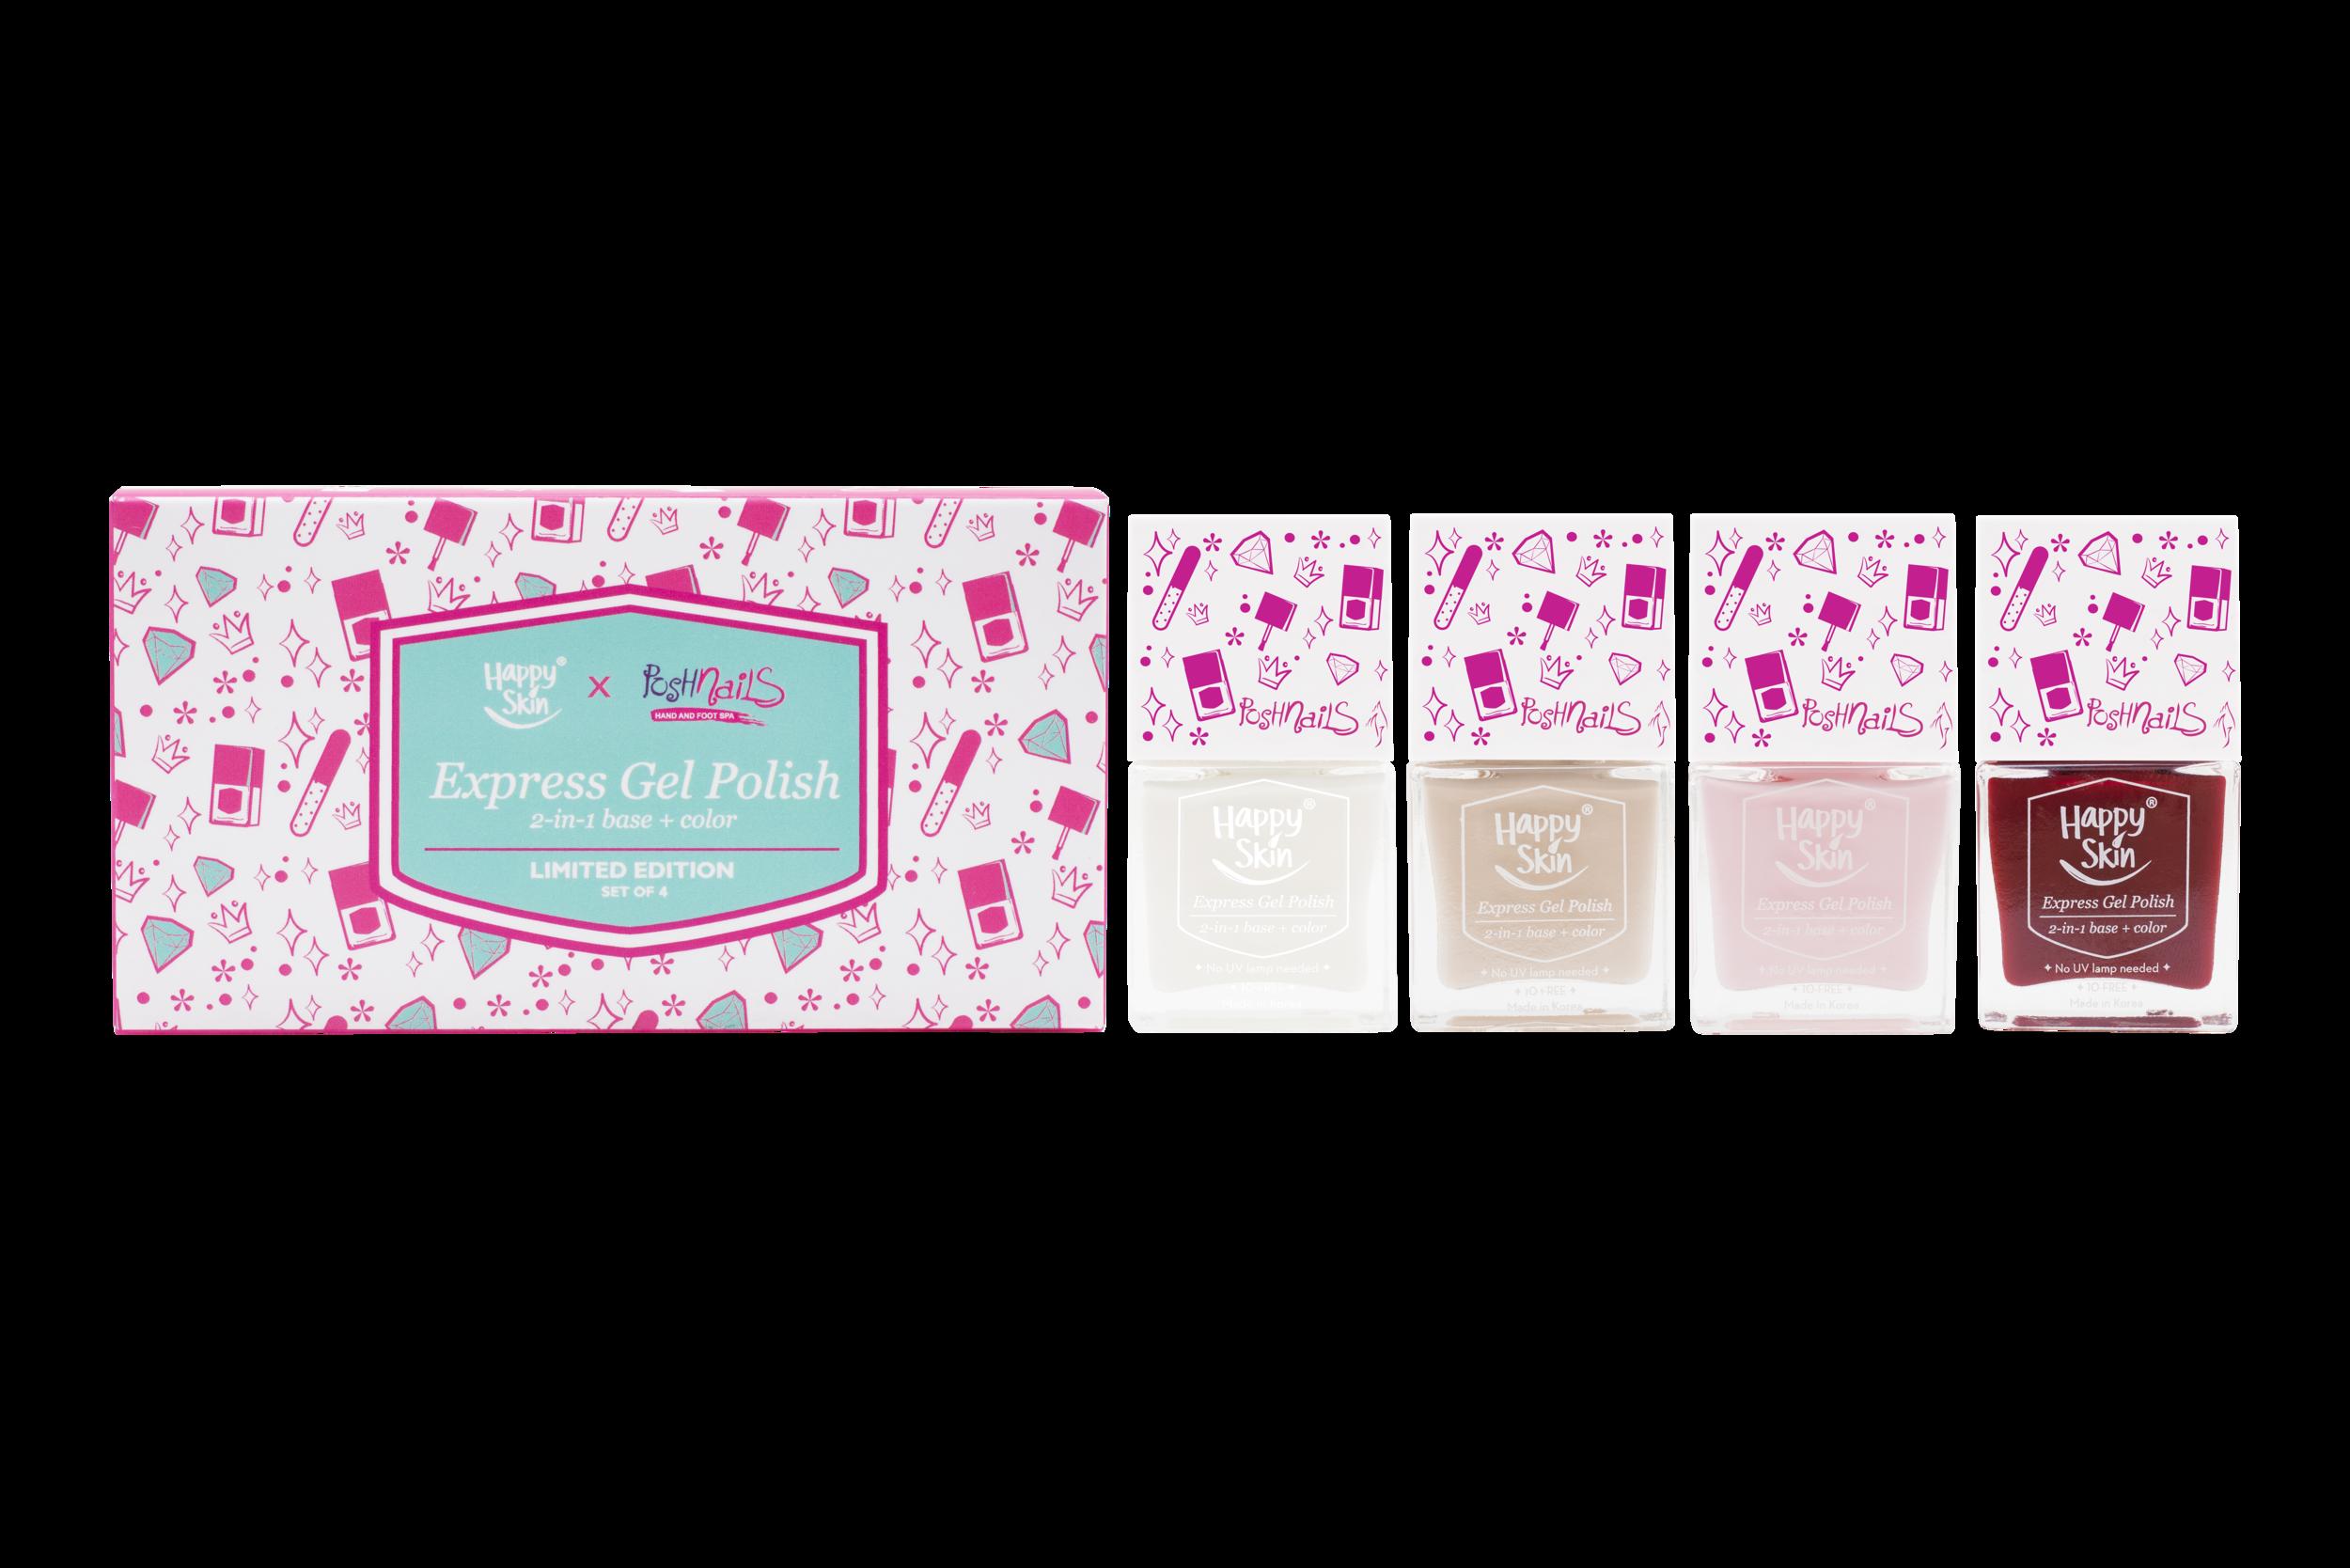 Happy Skin x Posh Nails Limited Edition Set